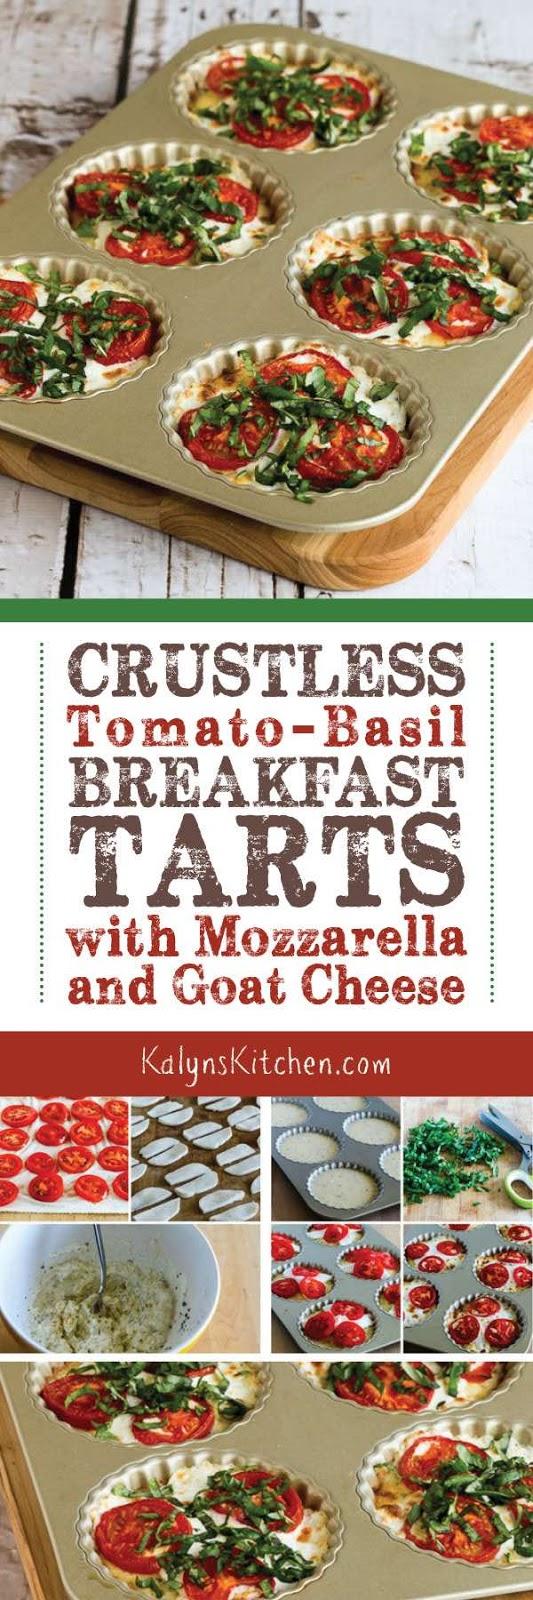 ... Crustless Tomato-Basil Breakfast Tarts with Mozzarella and Goat Cheese